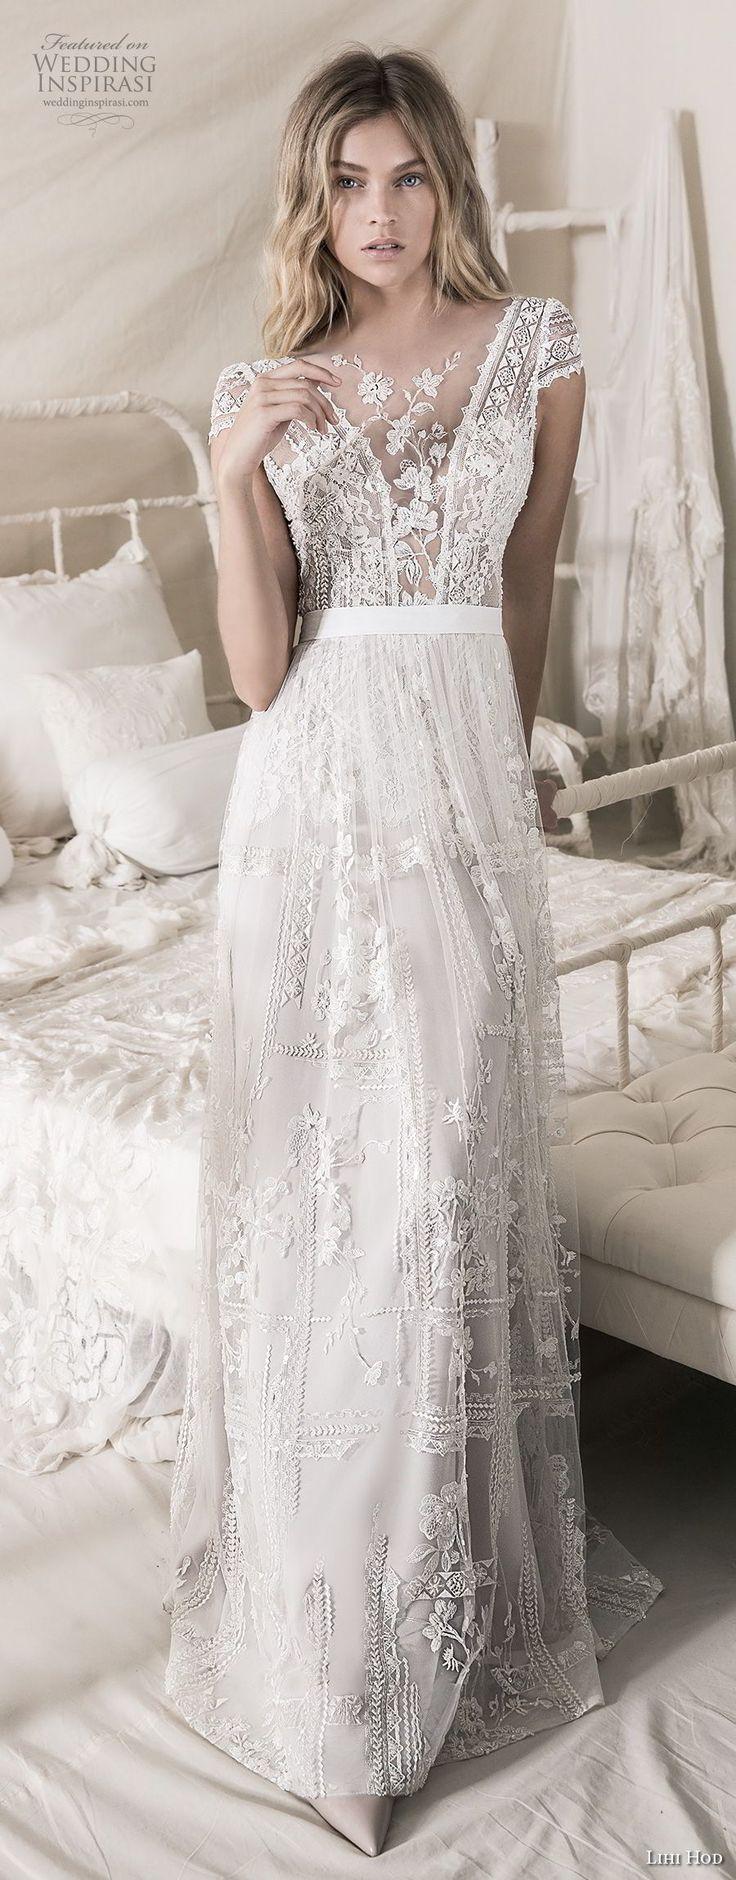 lihi hod 2018 bridal cap sleeves illusion jewel deep v neck heavily embellised bodice romantic bohemian soft a  line wedding dress open strap back sweep train (5) mv fv -- Lihi Hod 2018 Wedding Dresses